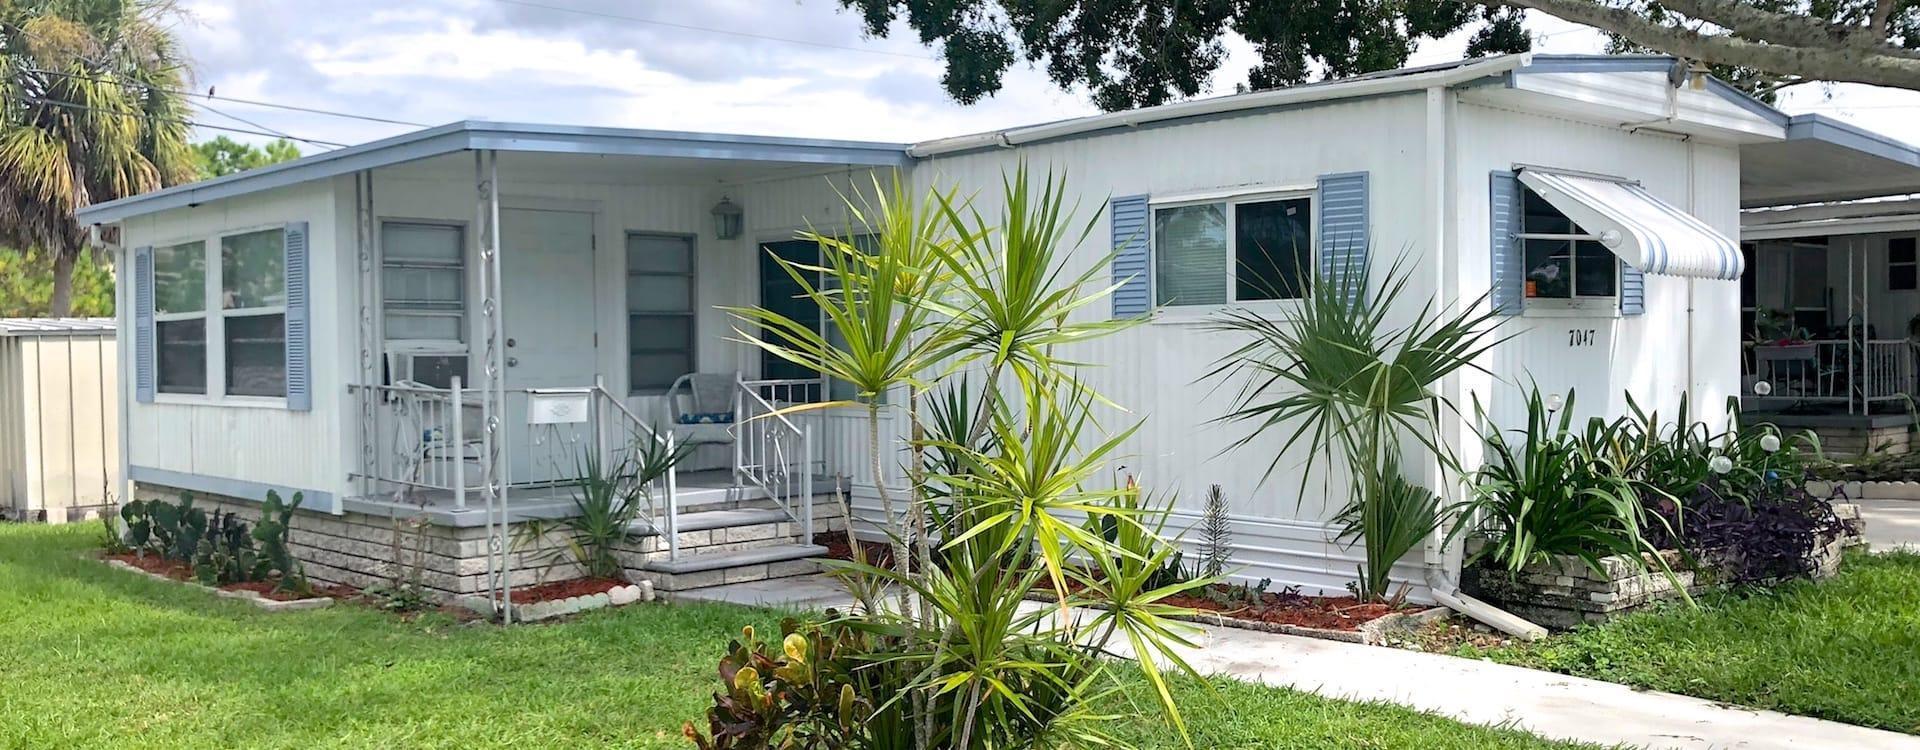 mobile home for sale seminole fl roycroft travel trailer park 7047 rh sunsetmhs com